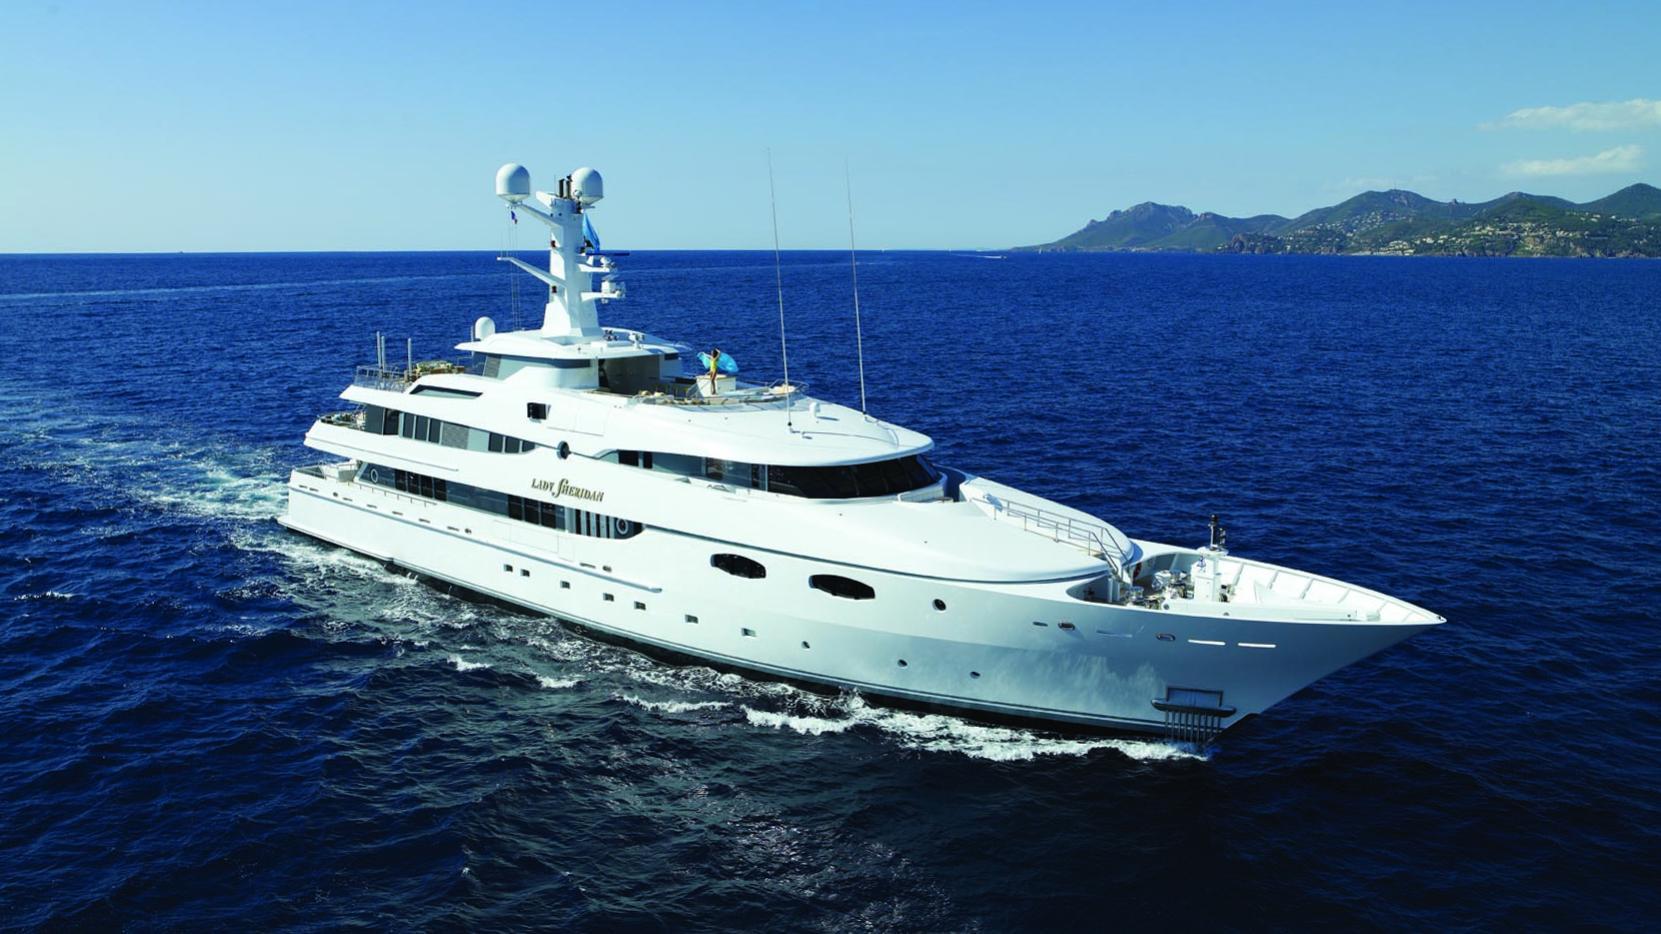 lady-sheridan-yacht-yacht-at-sea